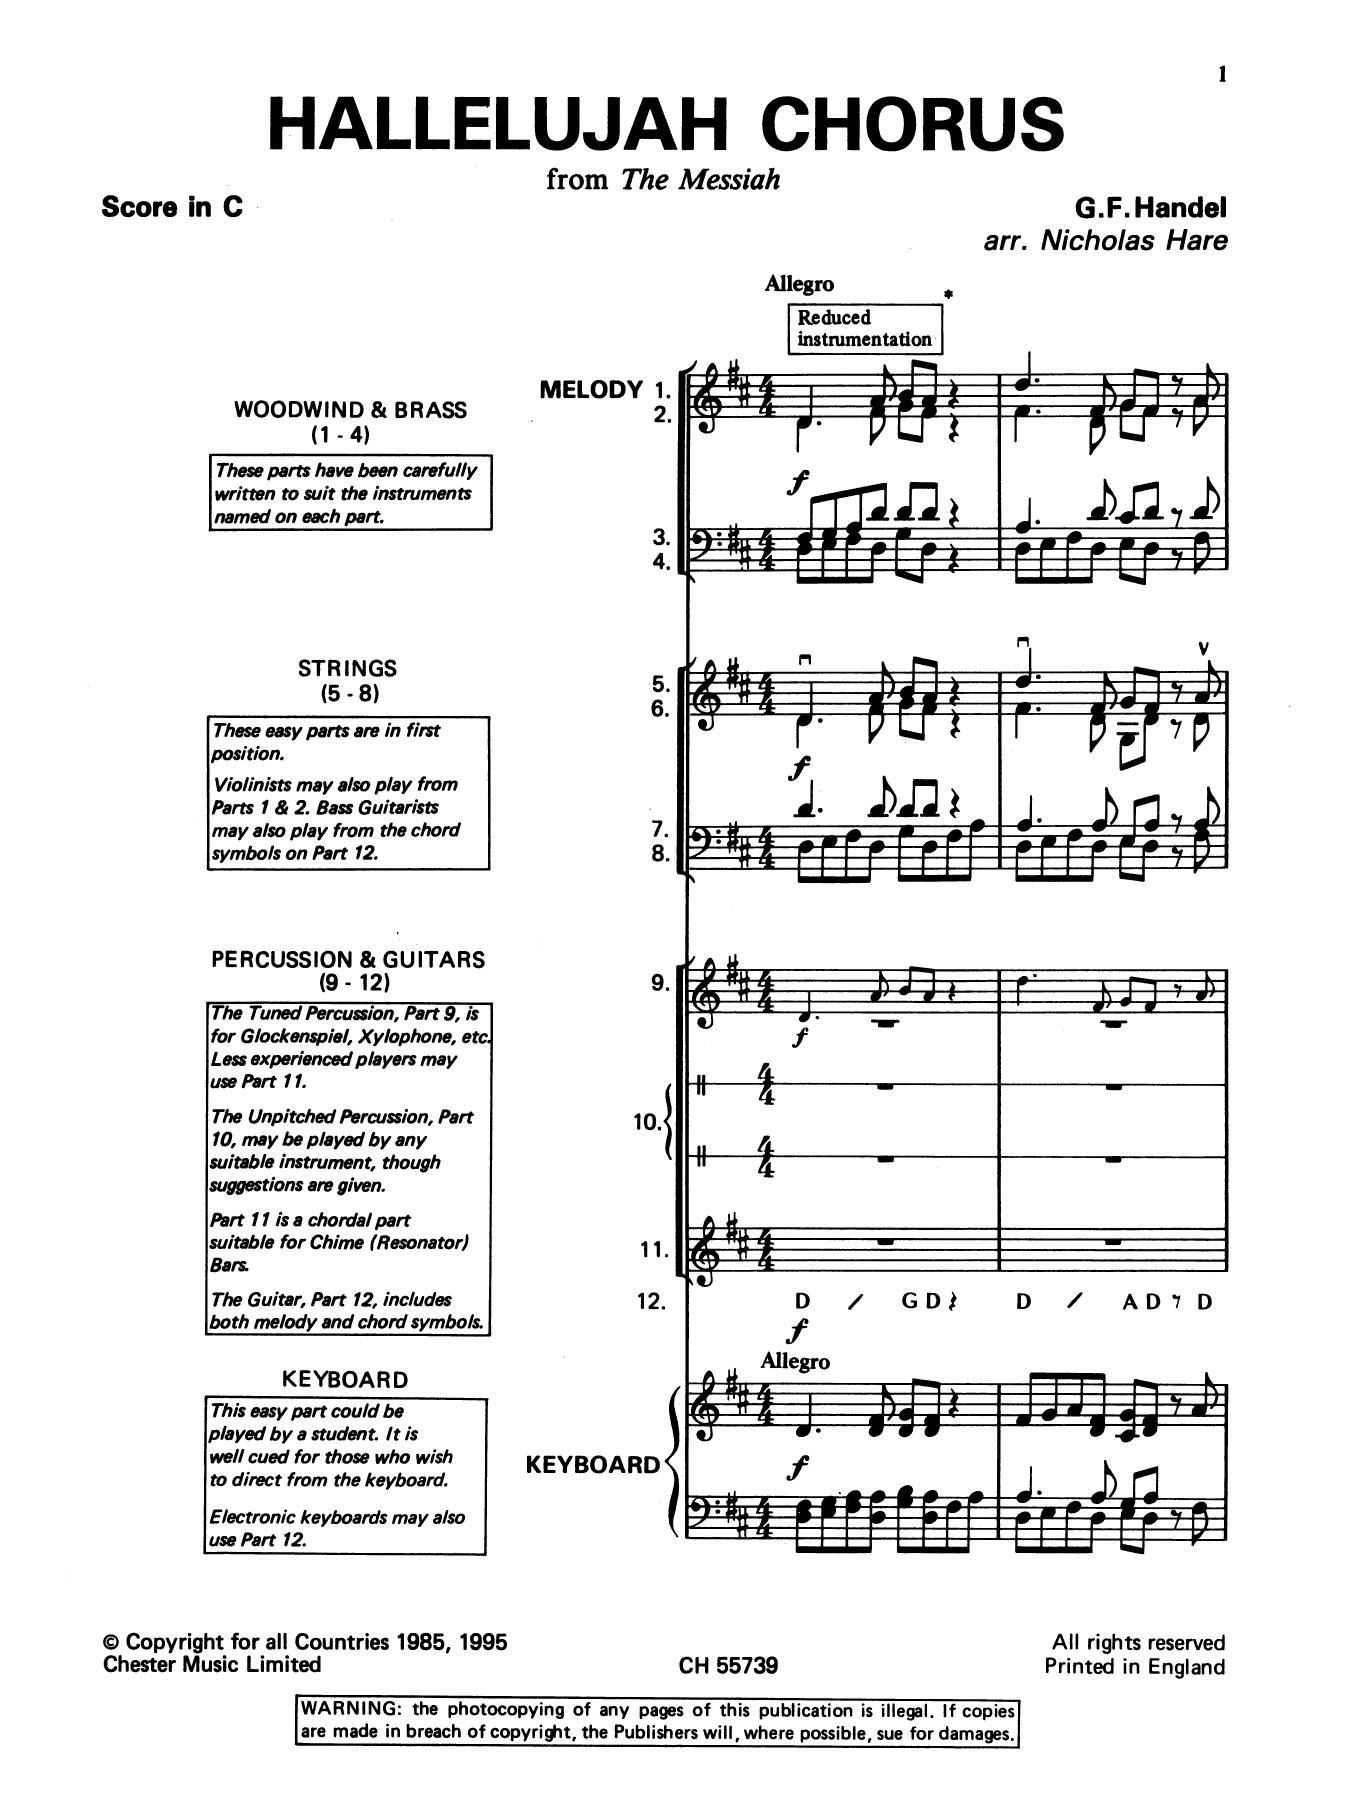 George Frideric Handel: Hallelujah Chorus (from The Messiah)